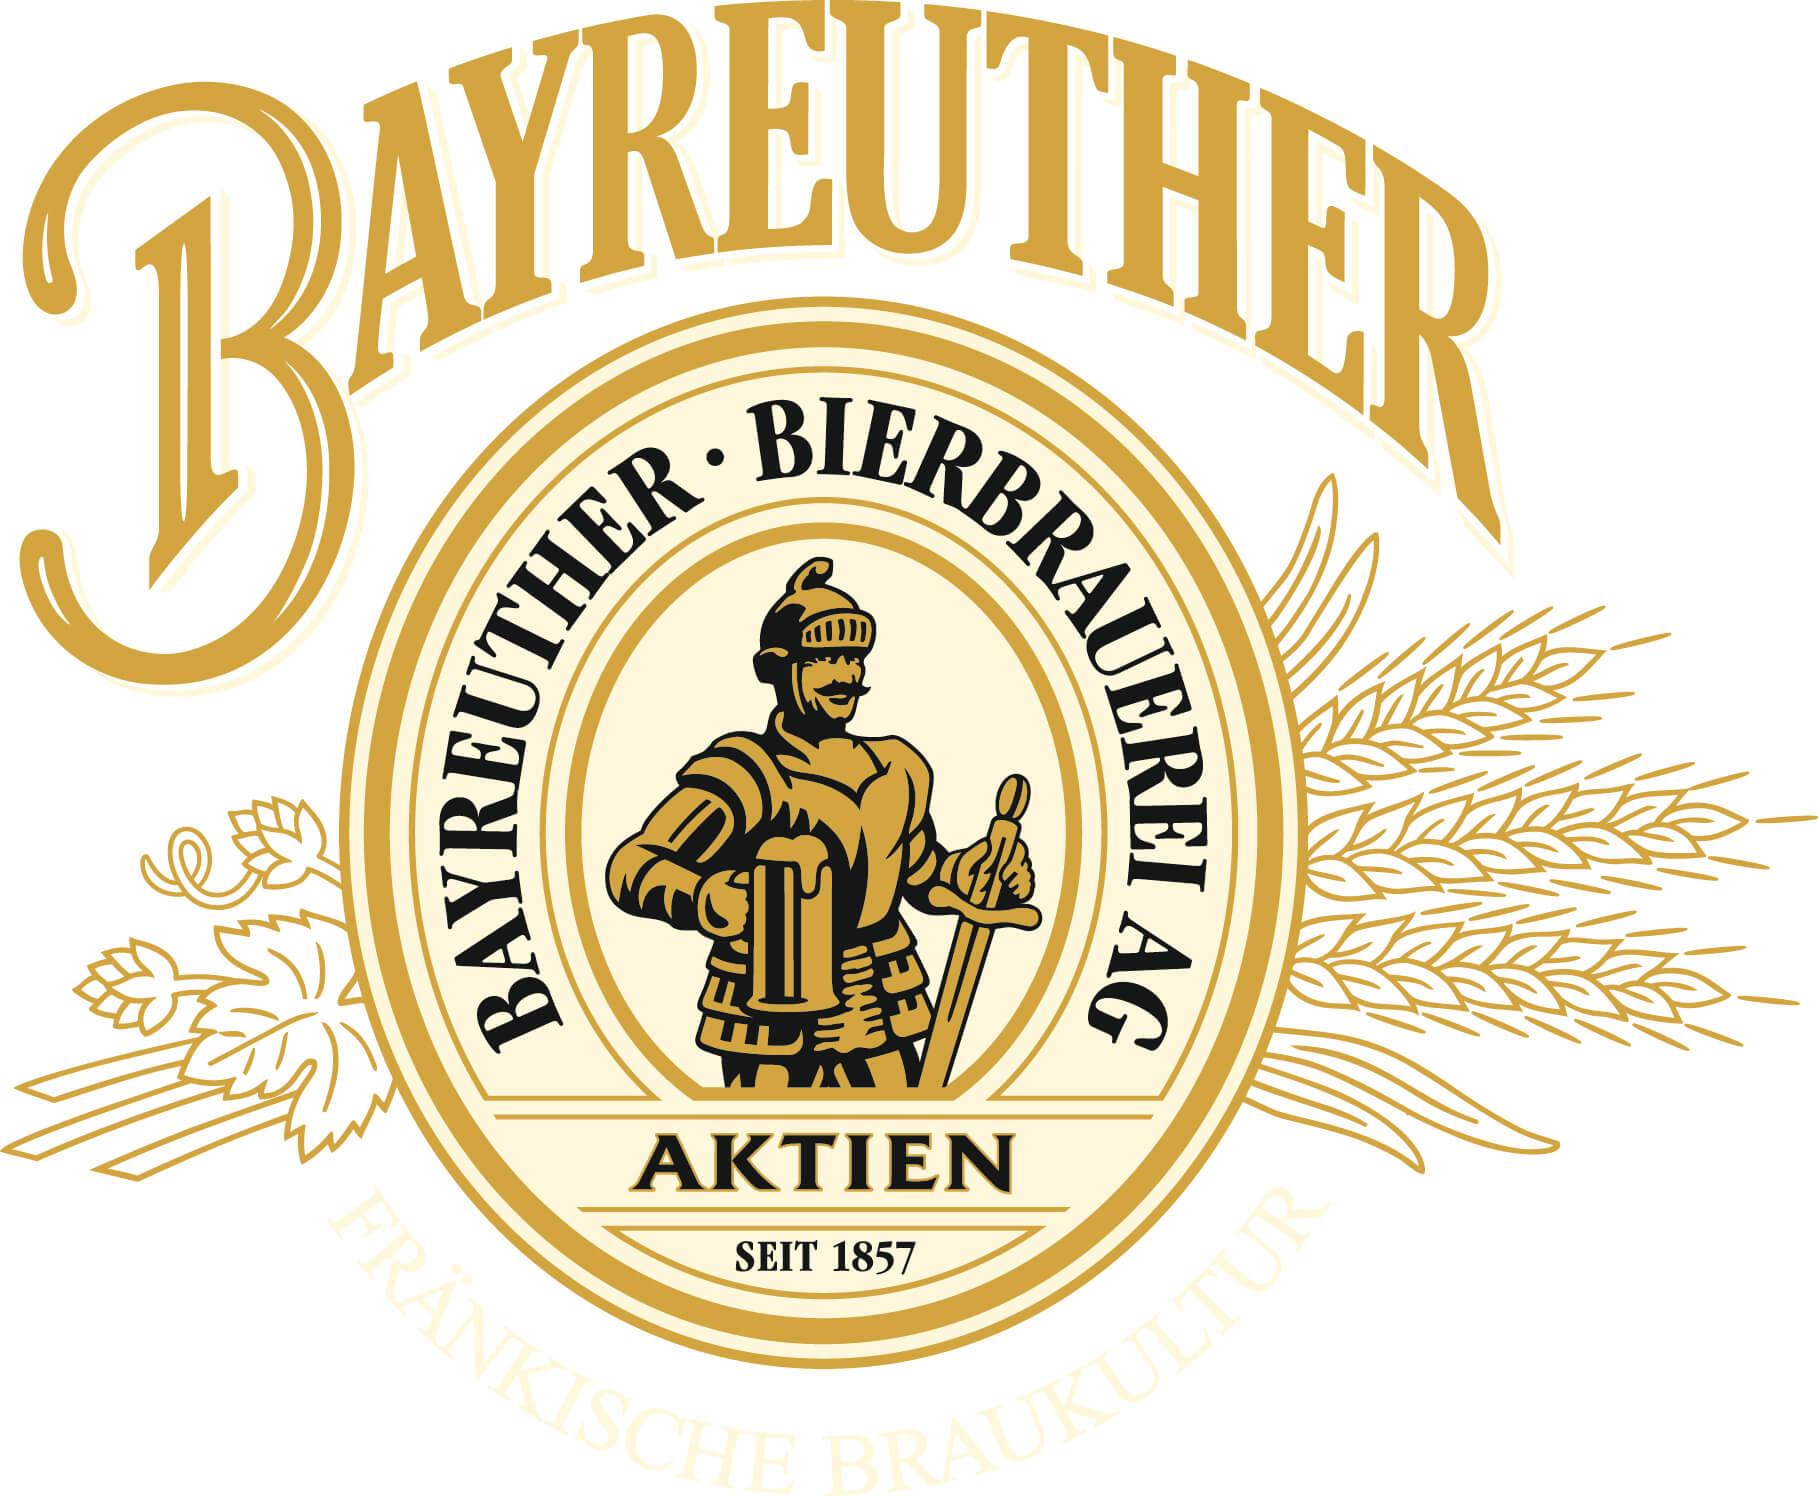 Bayreuther Brauerei AG Aktien